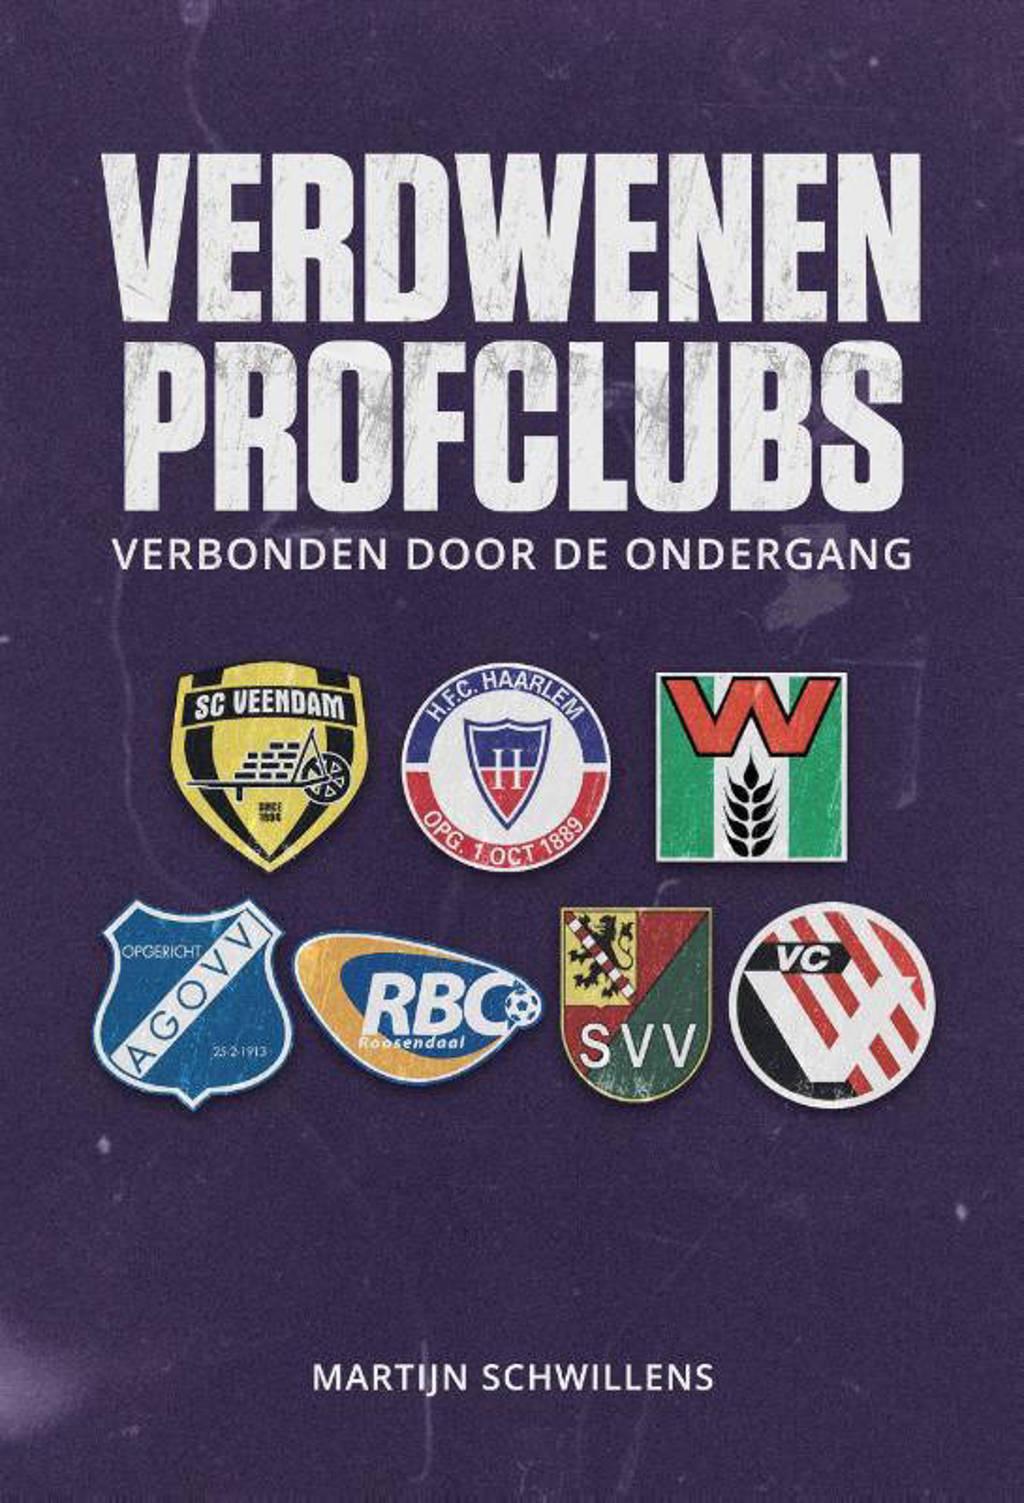 Verdwenen profclubs - Martijn Schwillens